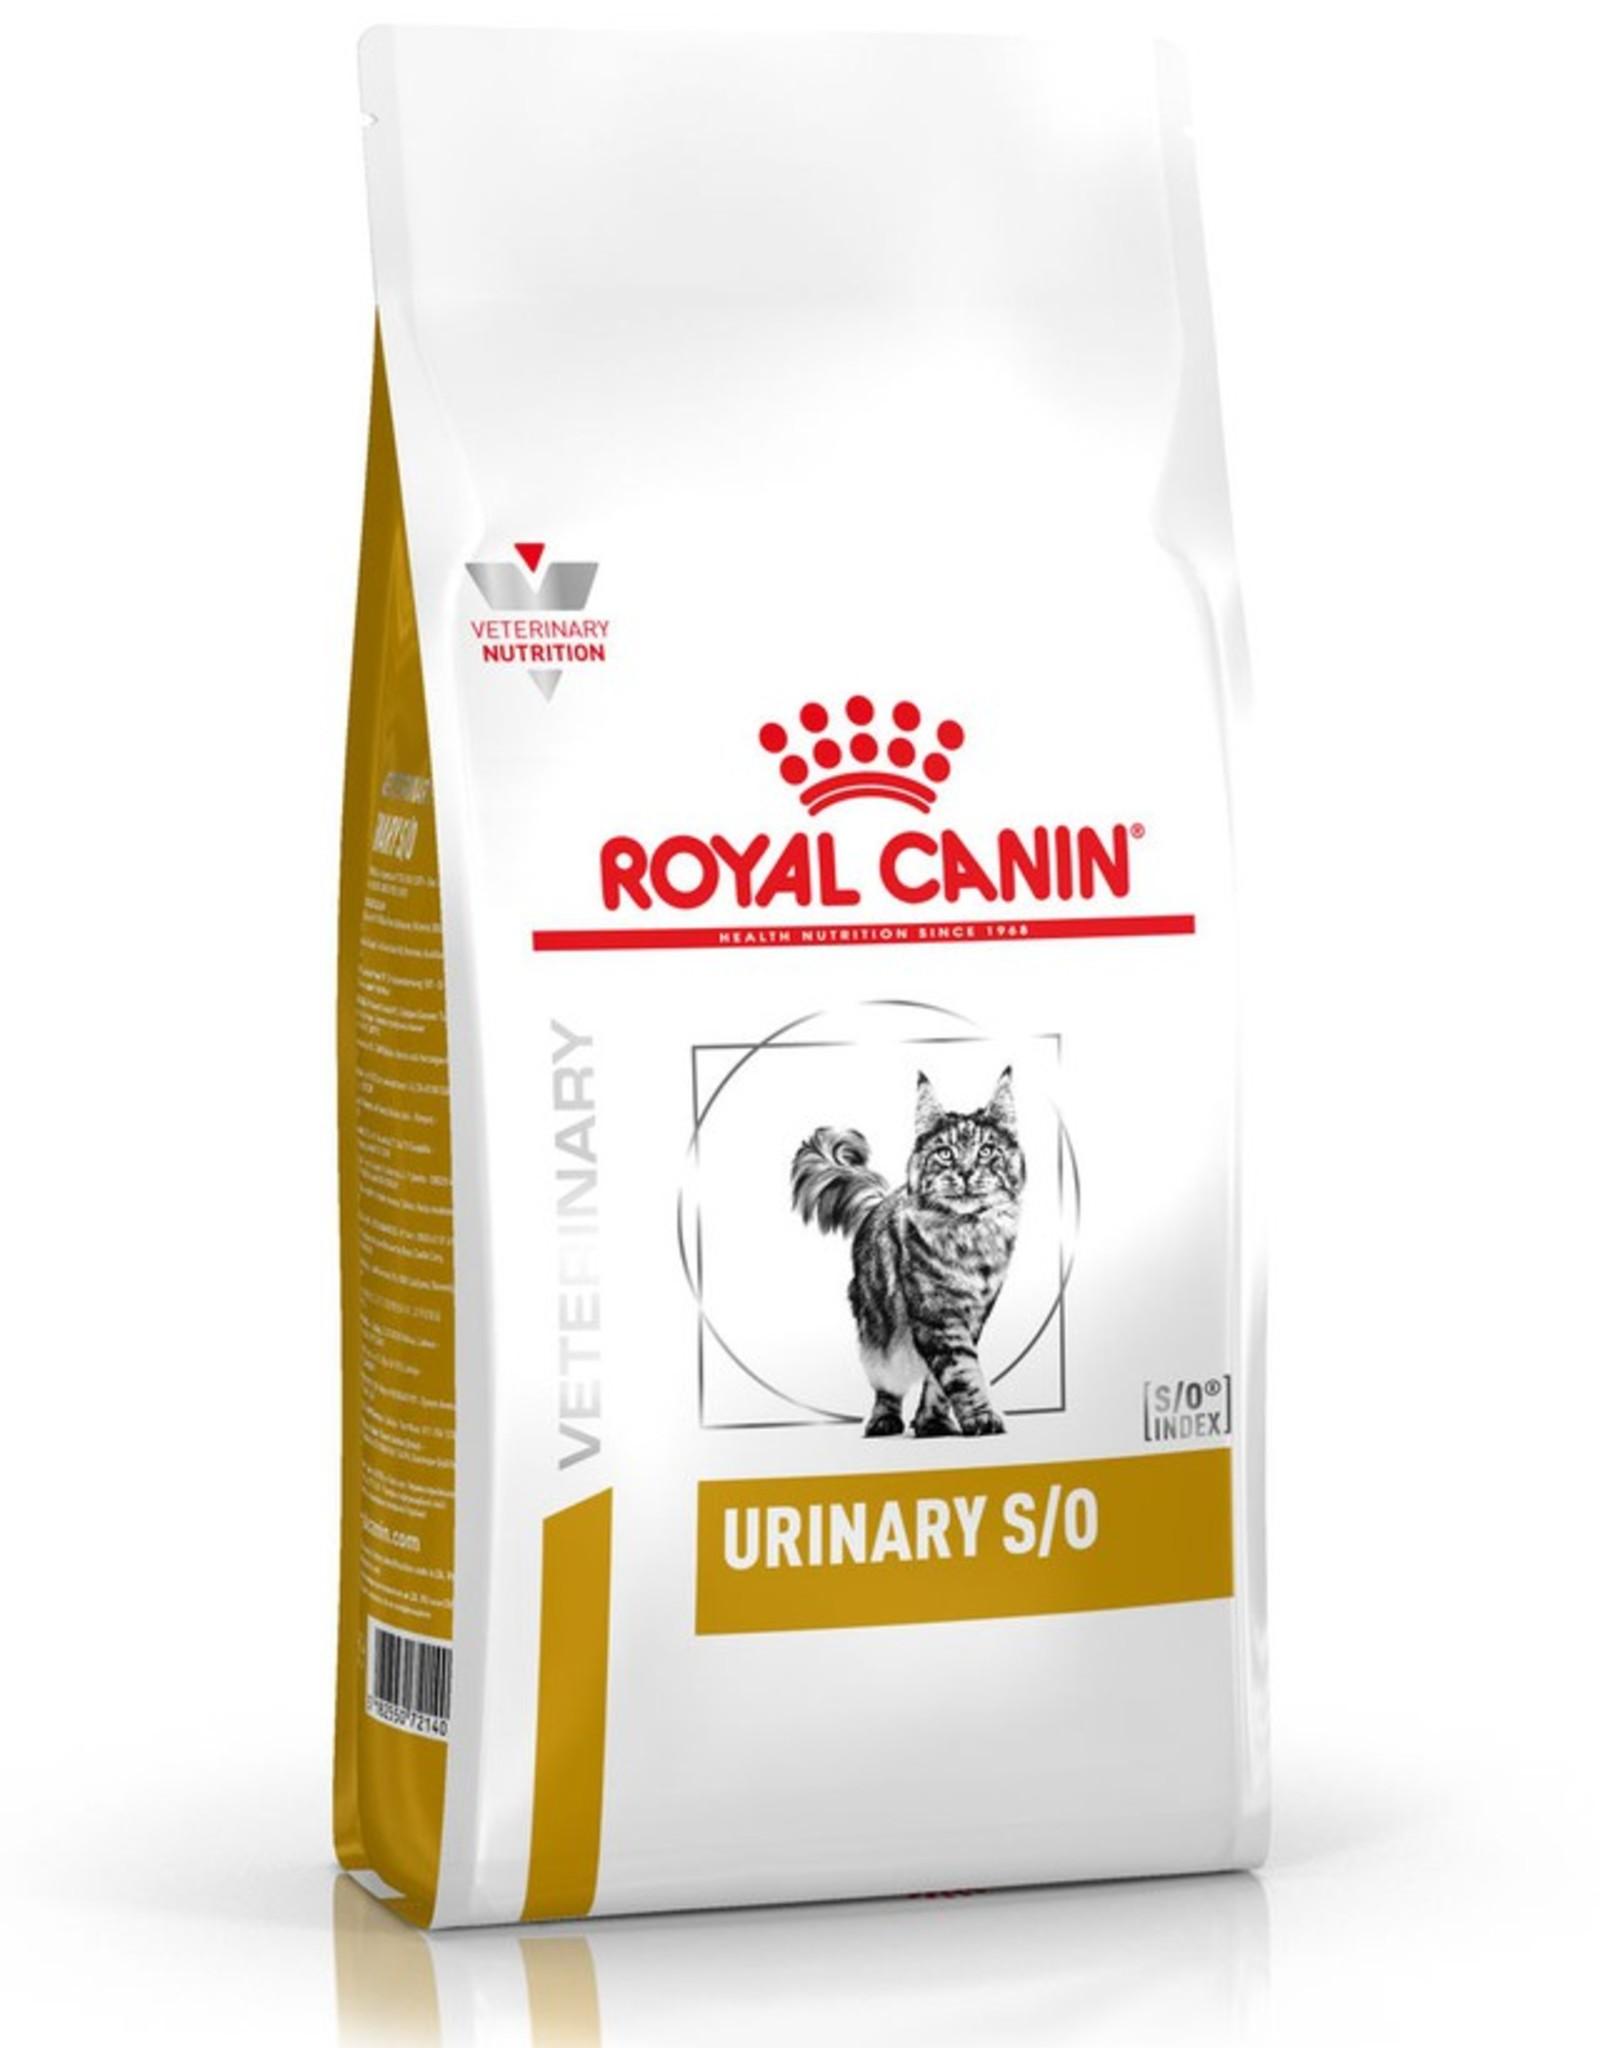 Royal Canin Royal Canin Urinary S/o Katze 3,5kg